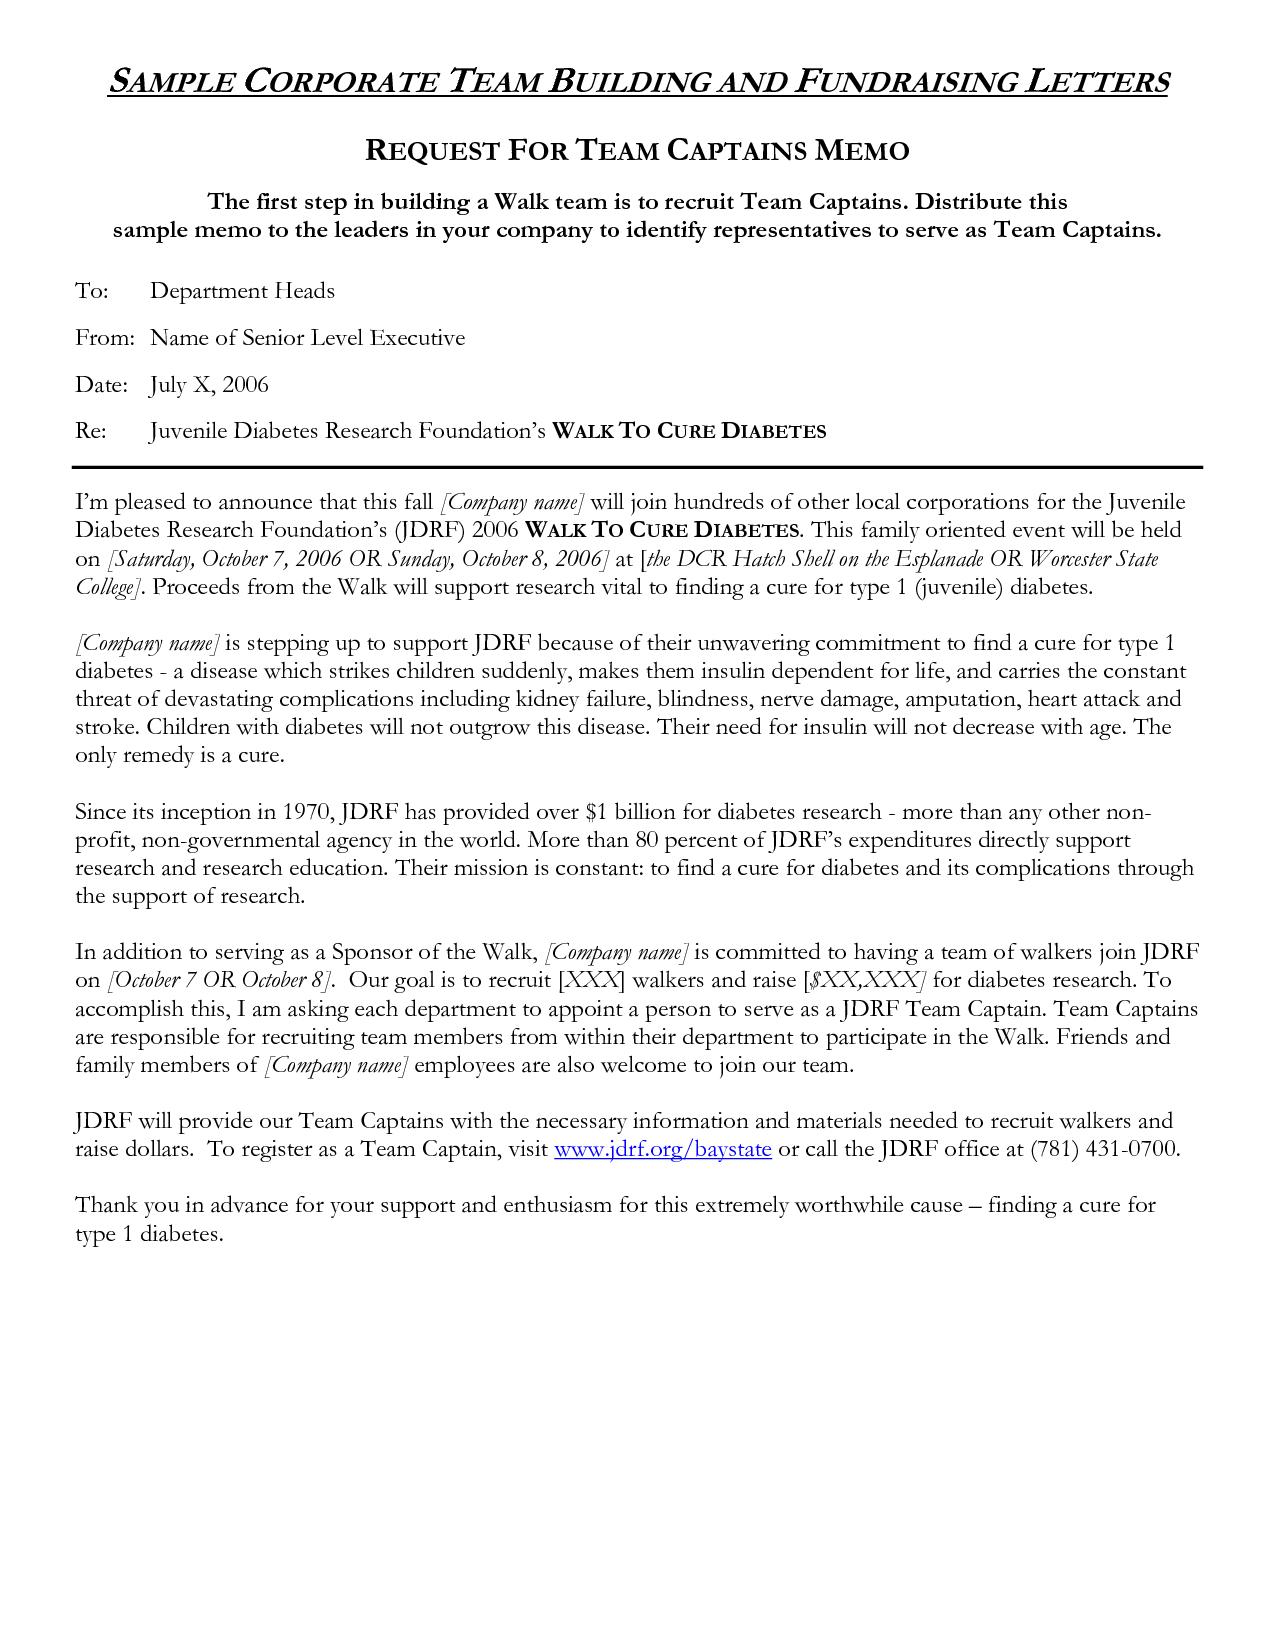 Team Building Invitation Sample Letter